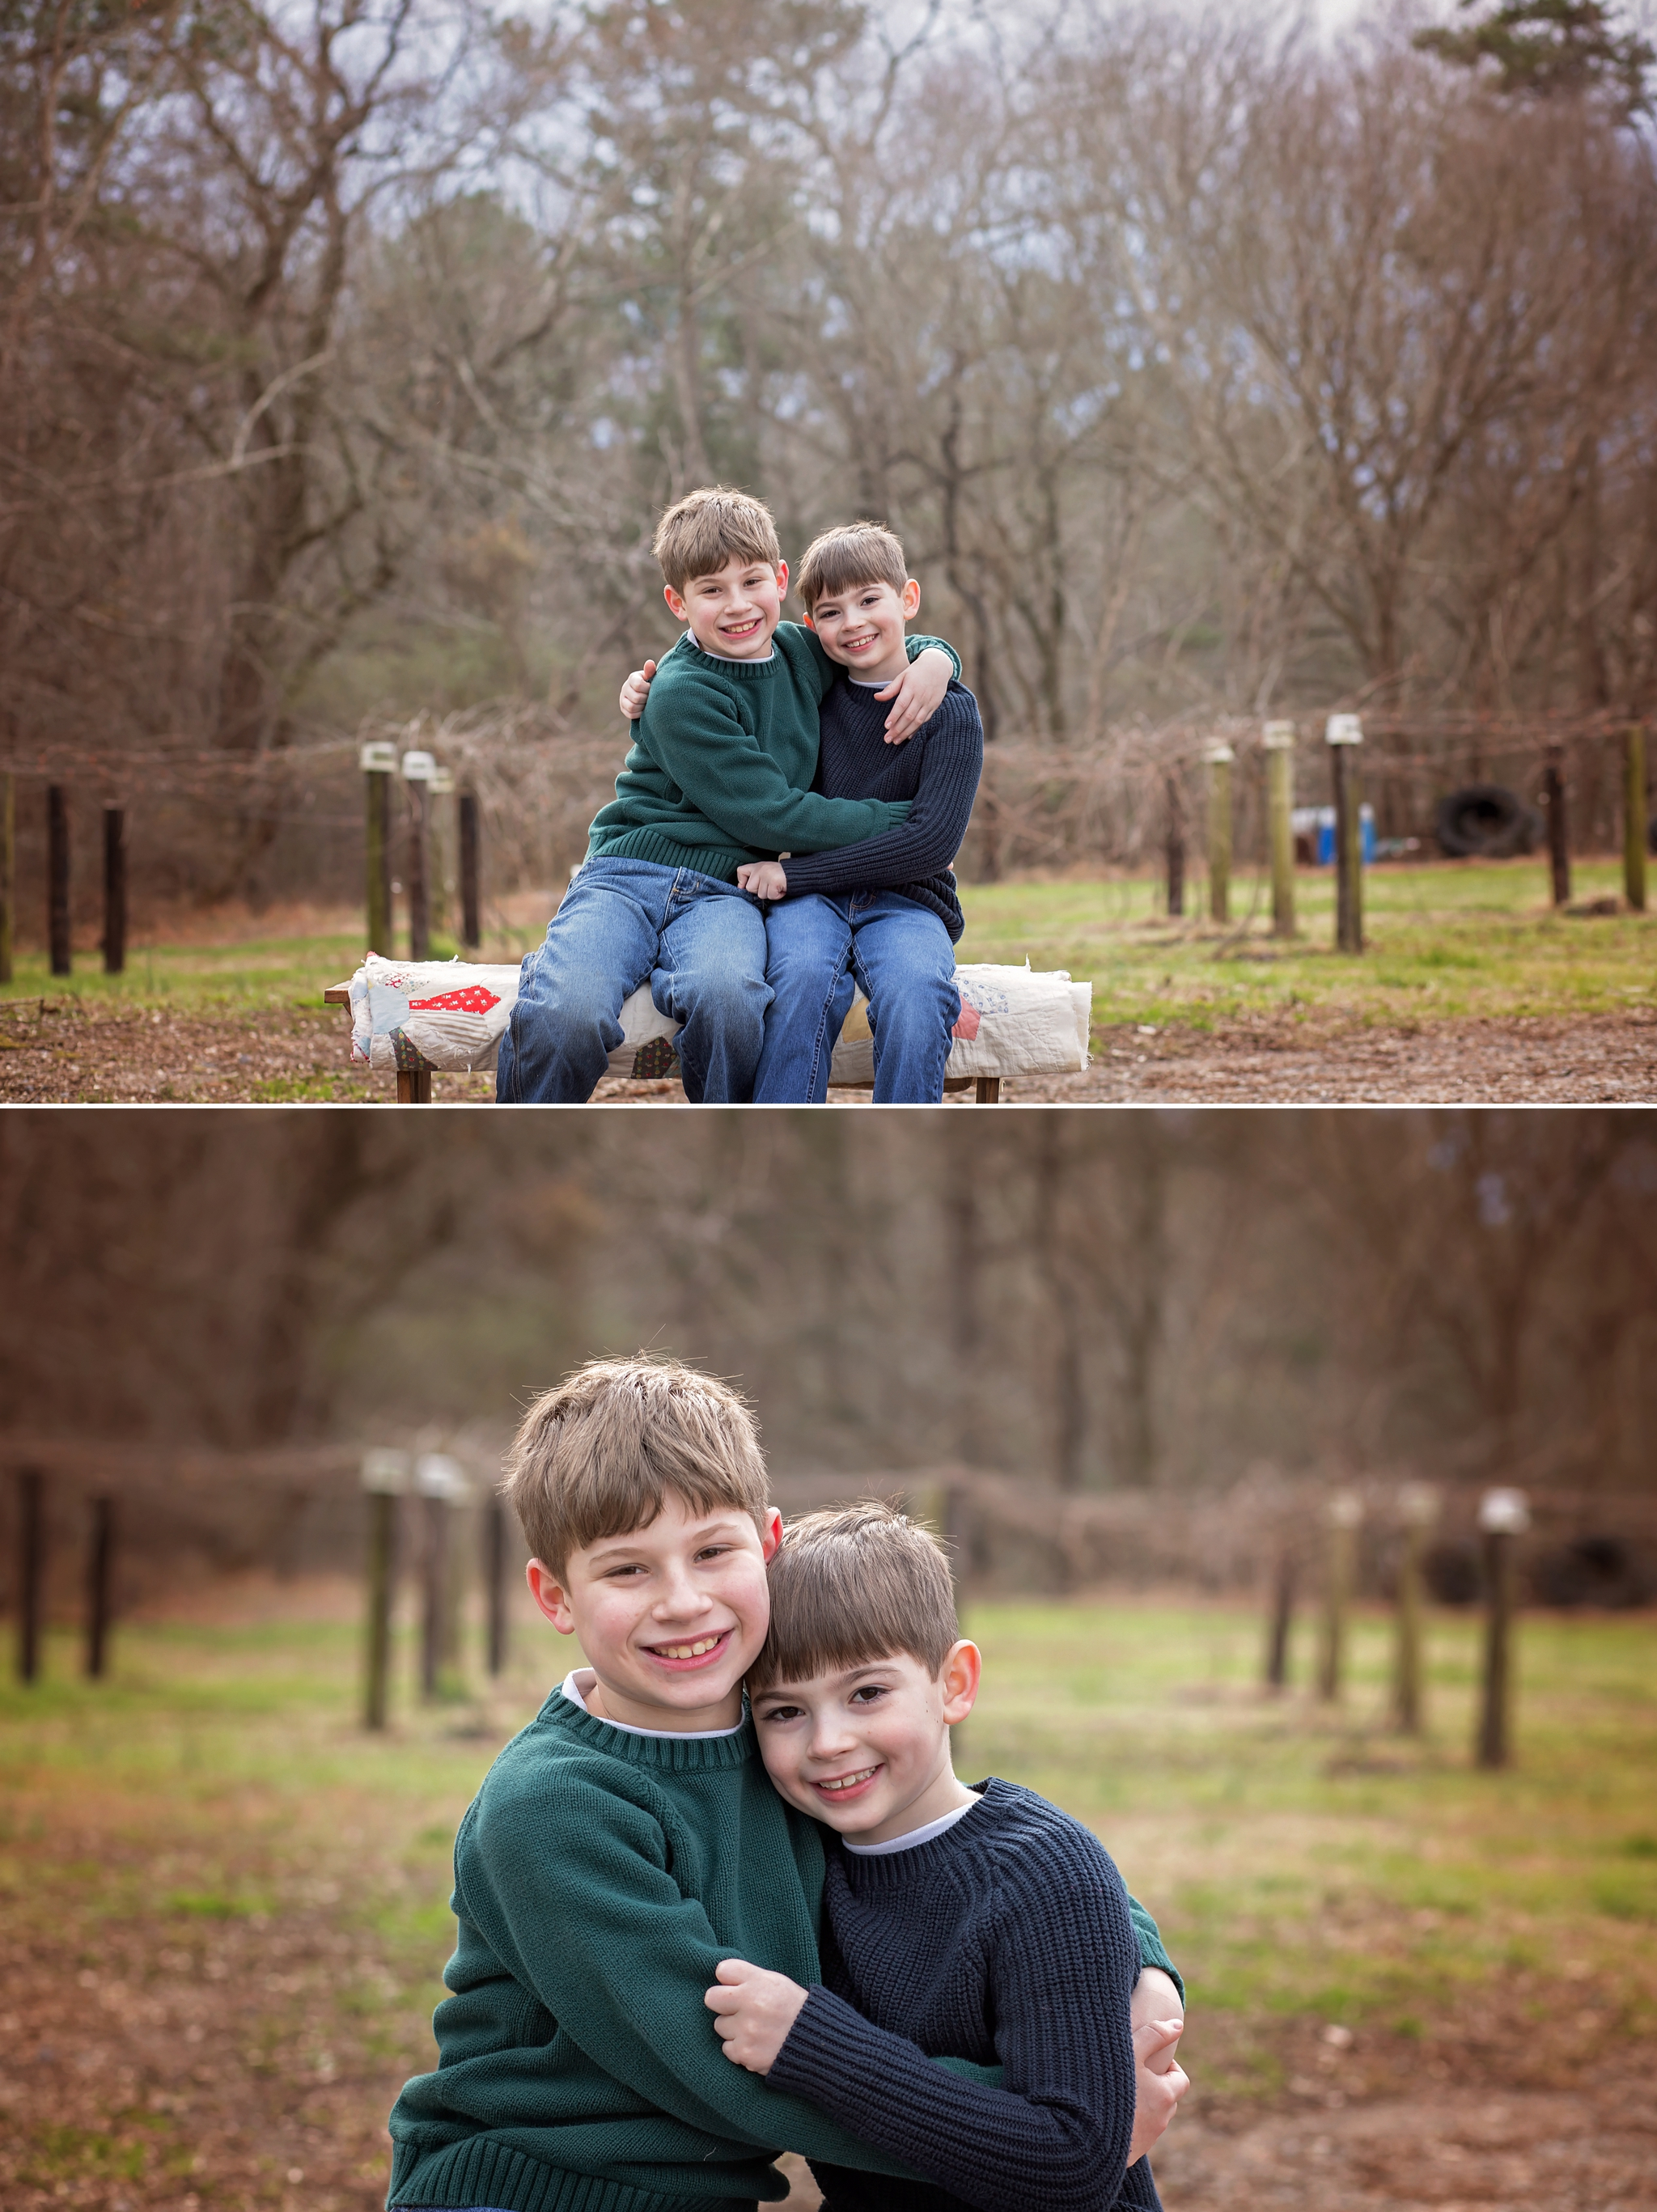 Brothers hug in field in Sanford NC.